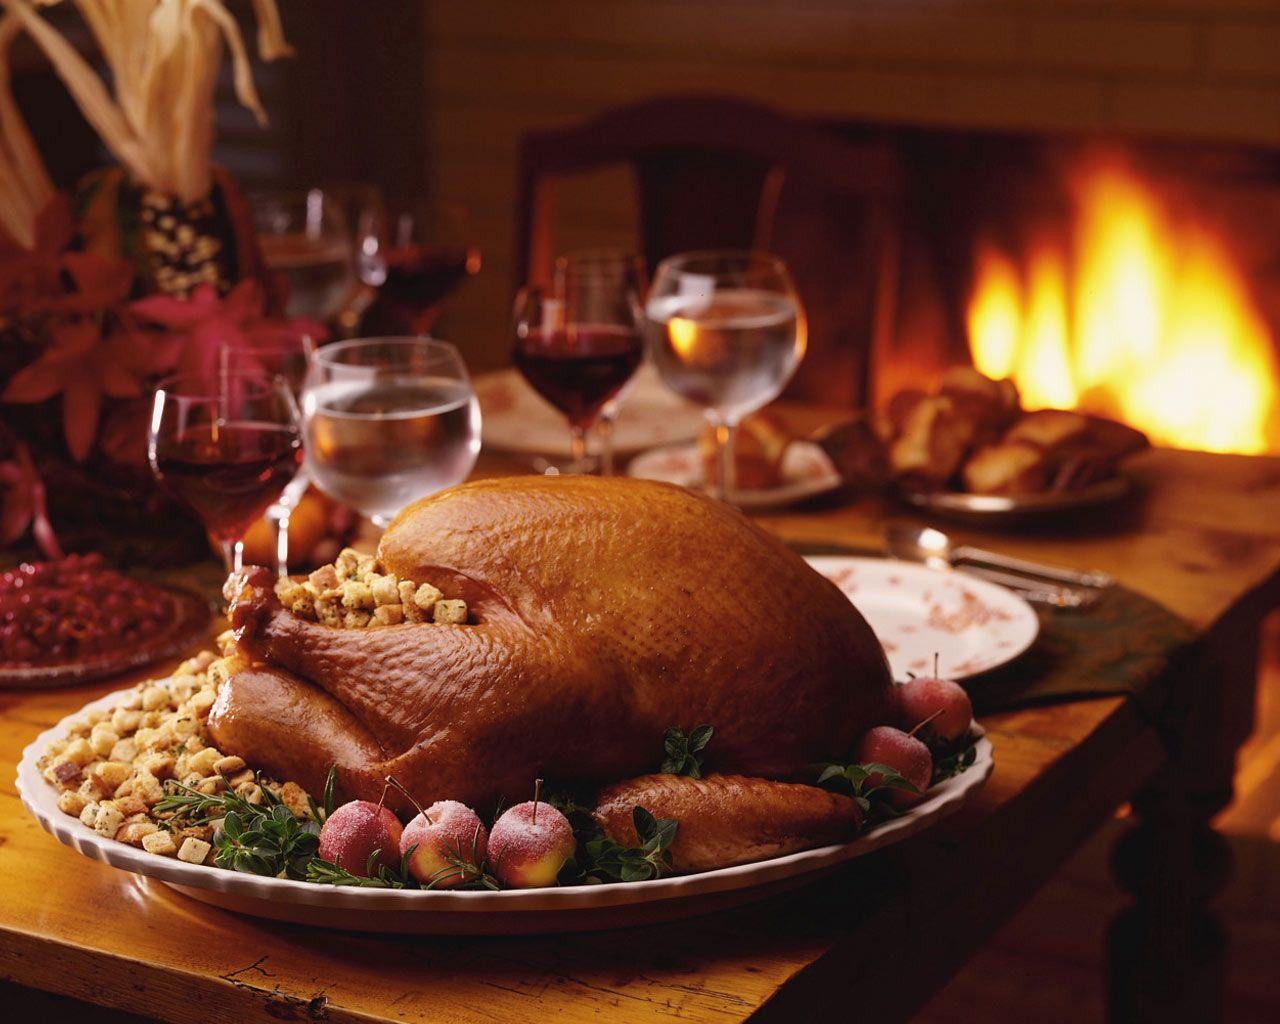 Turkey On Thanksgiving  Christmas Wallpapers Thanksgiving Roasted Turkey